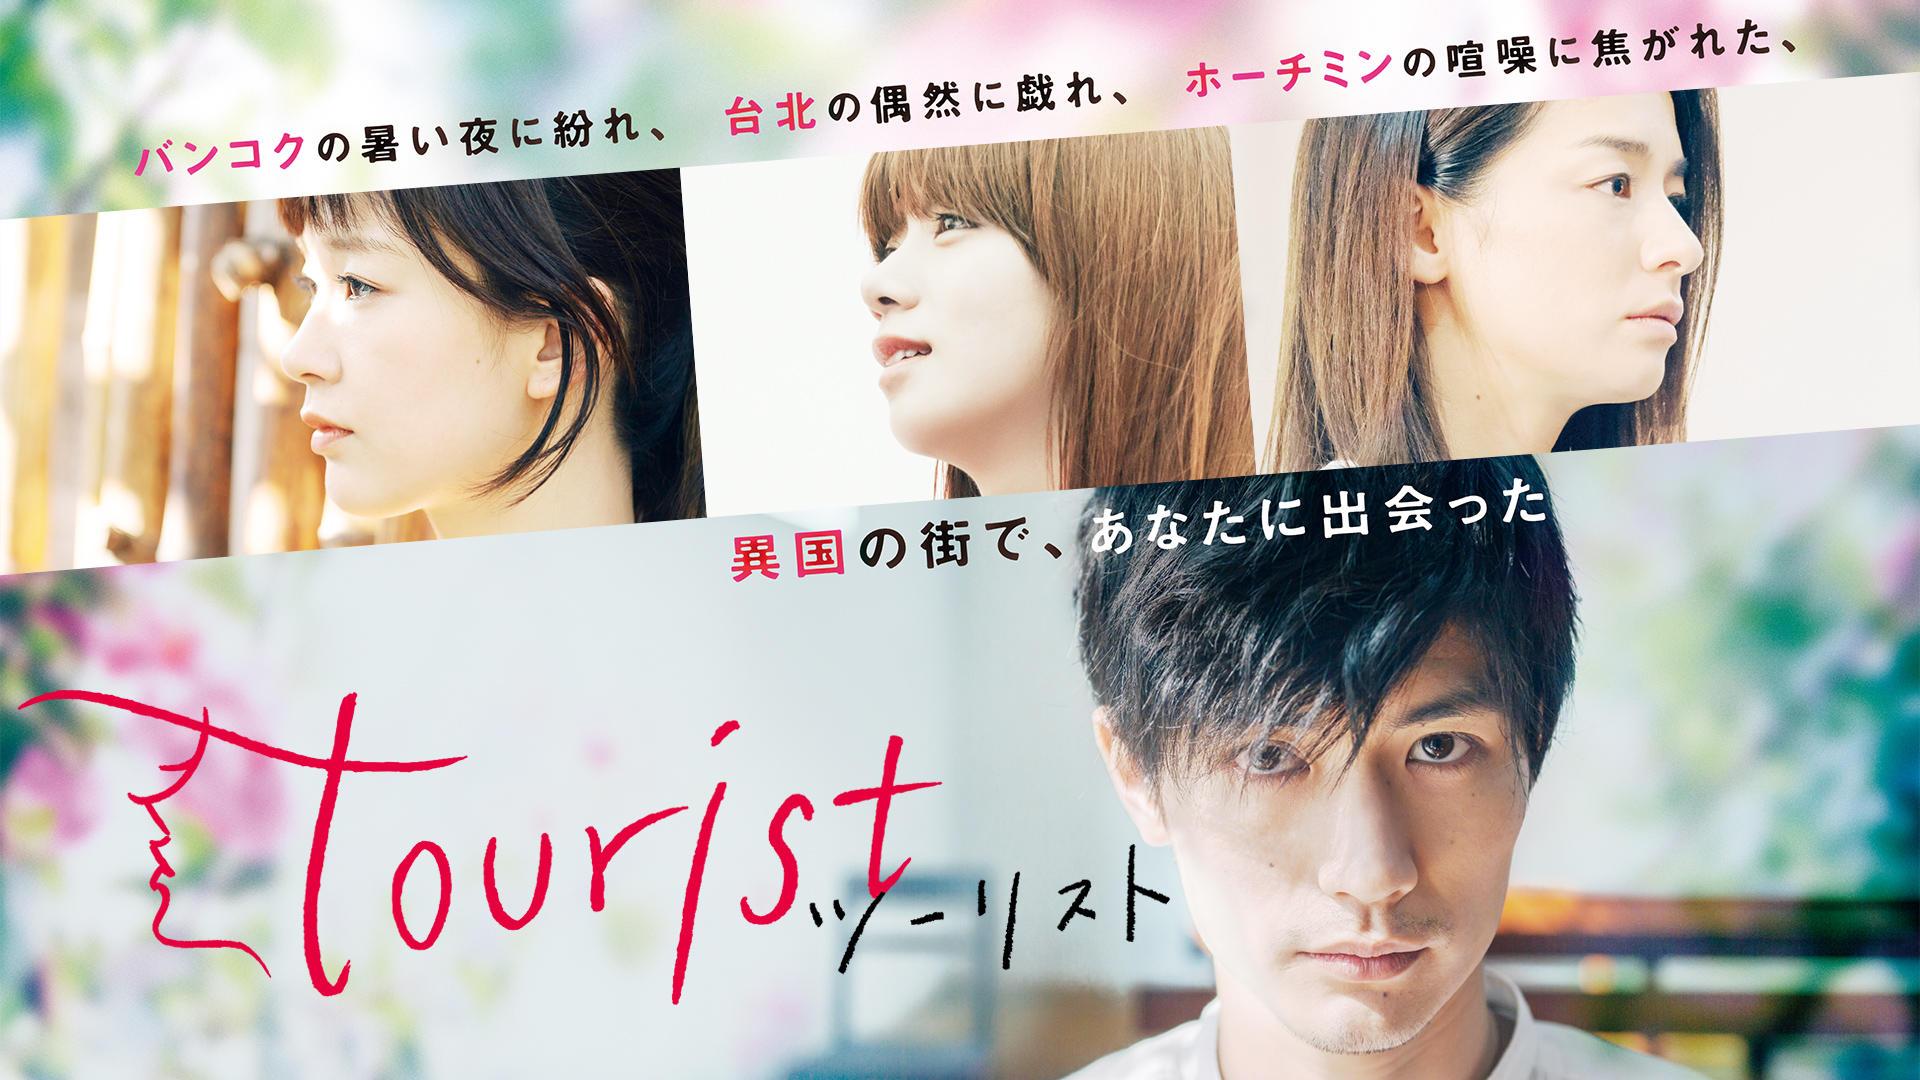 20181113_touristmiura_05.jpg